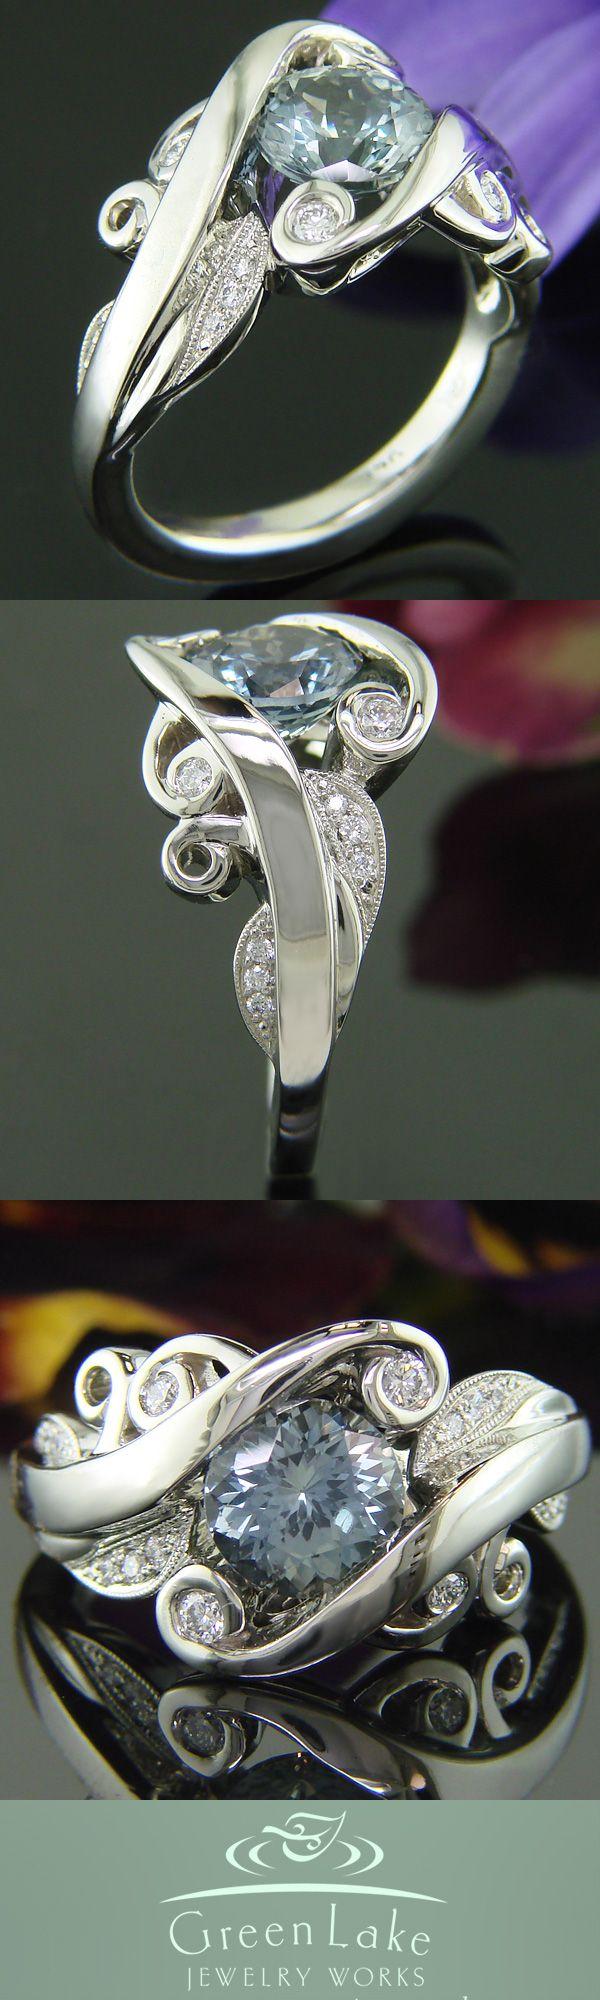 #greenlakejewelry Swirl Ring Would Make An Enchanting #engagementring! #ido